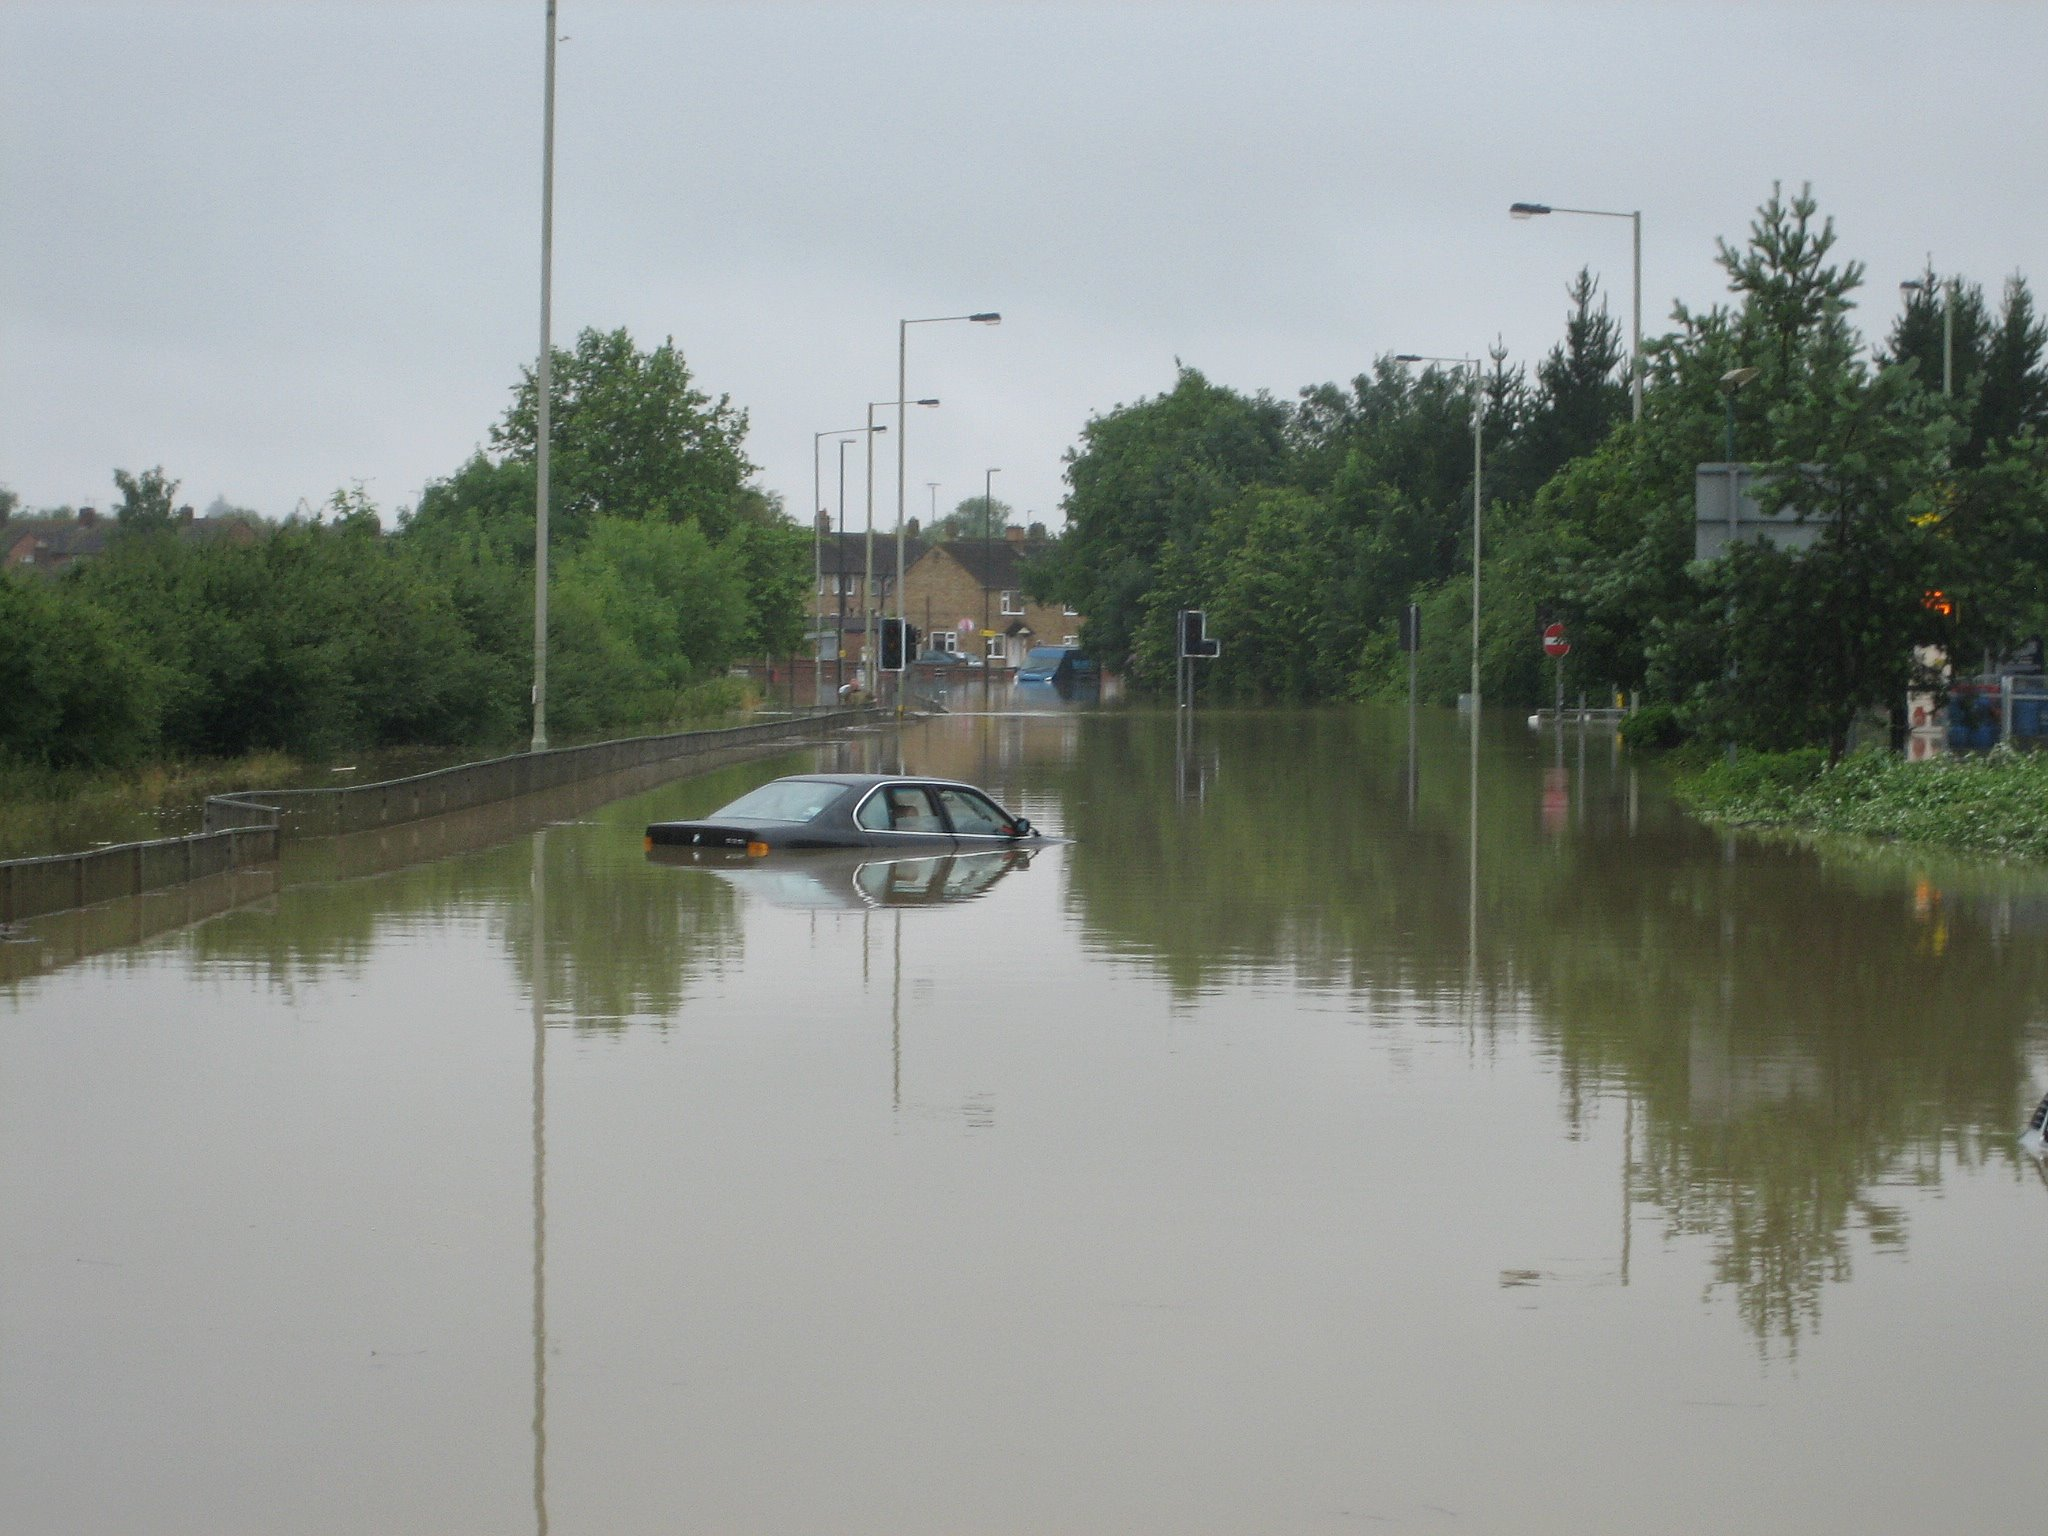 tewkesbury floods Tewkesbury 7 day weather forecast including weather warnings, temperature, rain, wind speed, cloud, pressure and uv index.